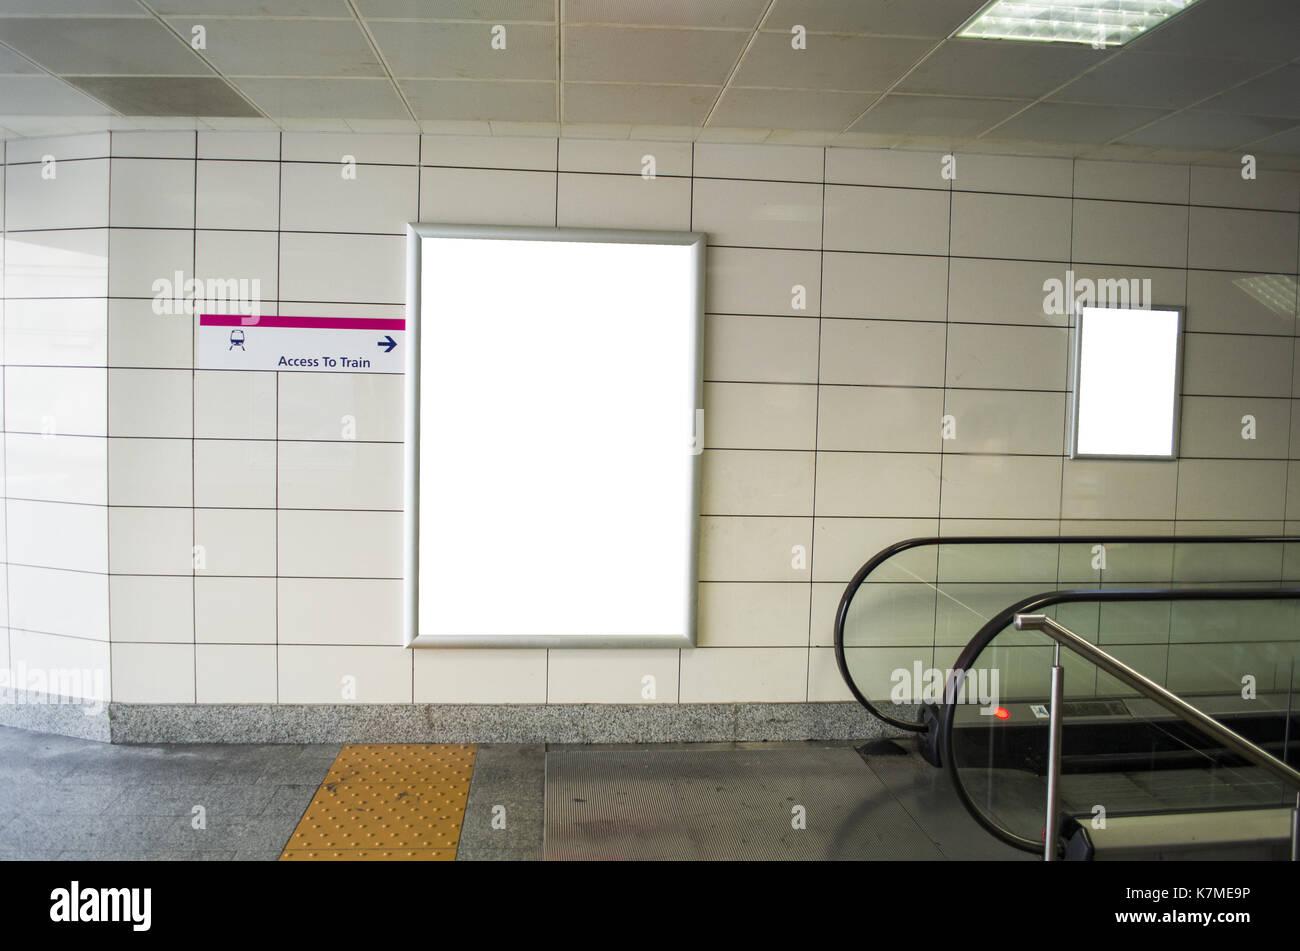 Blank billboard in subway station - Stock Image